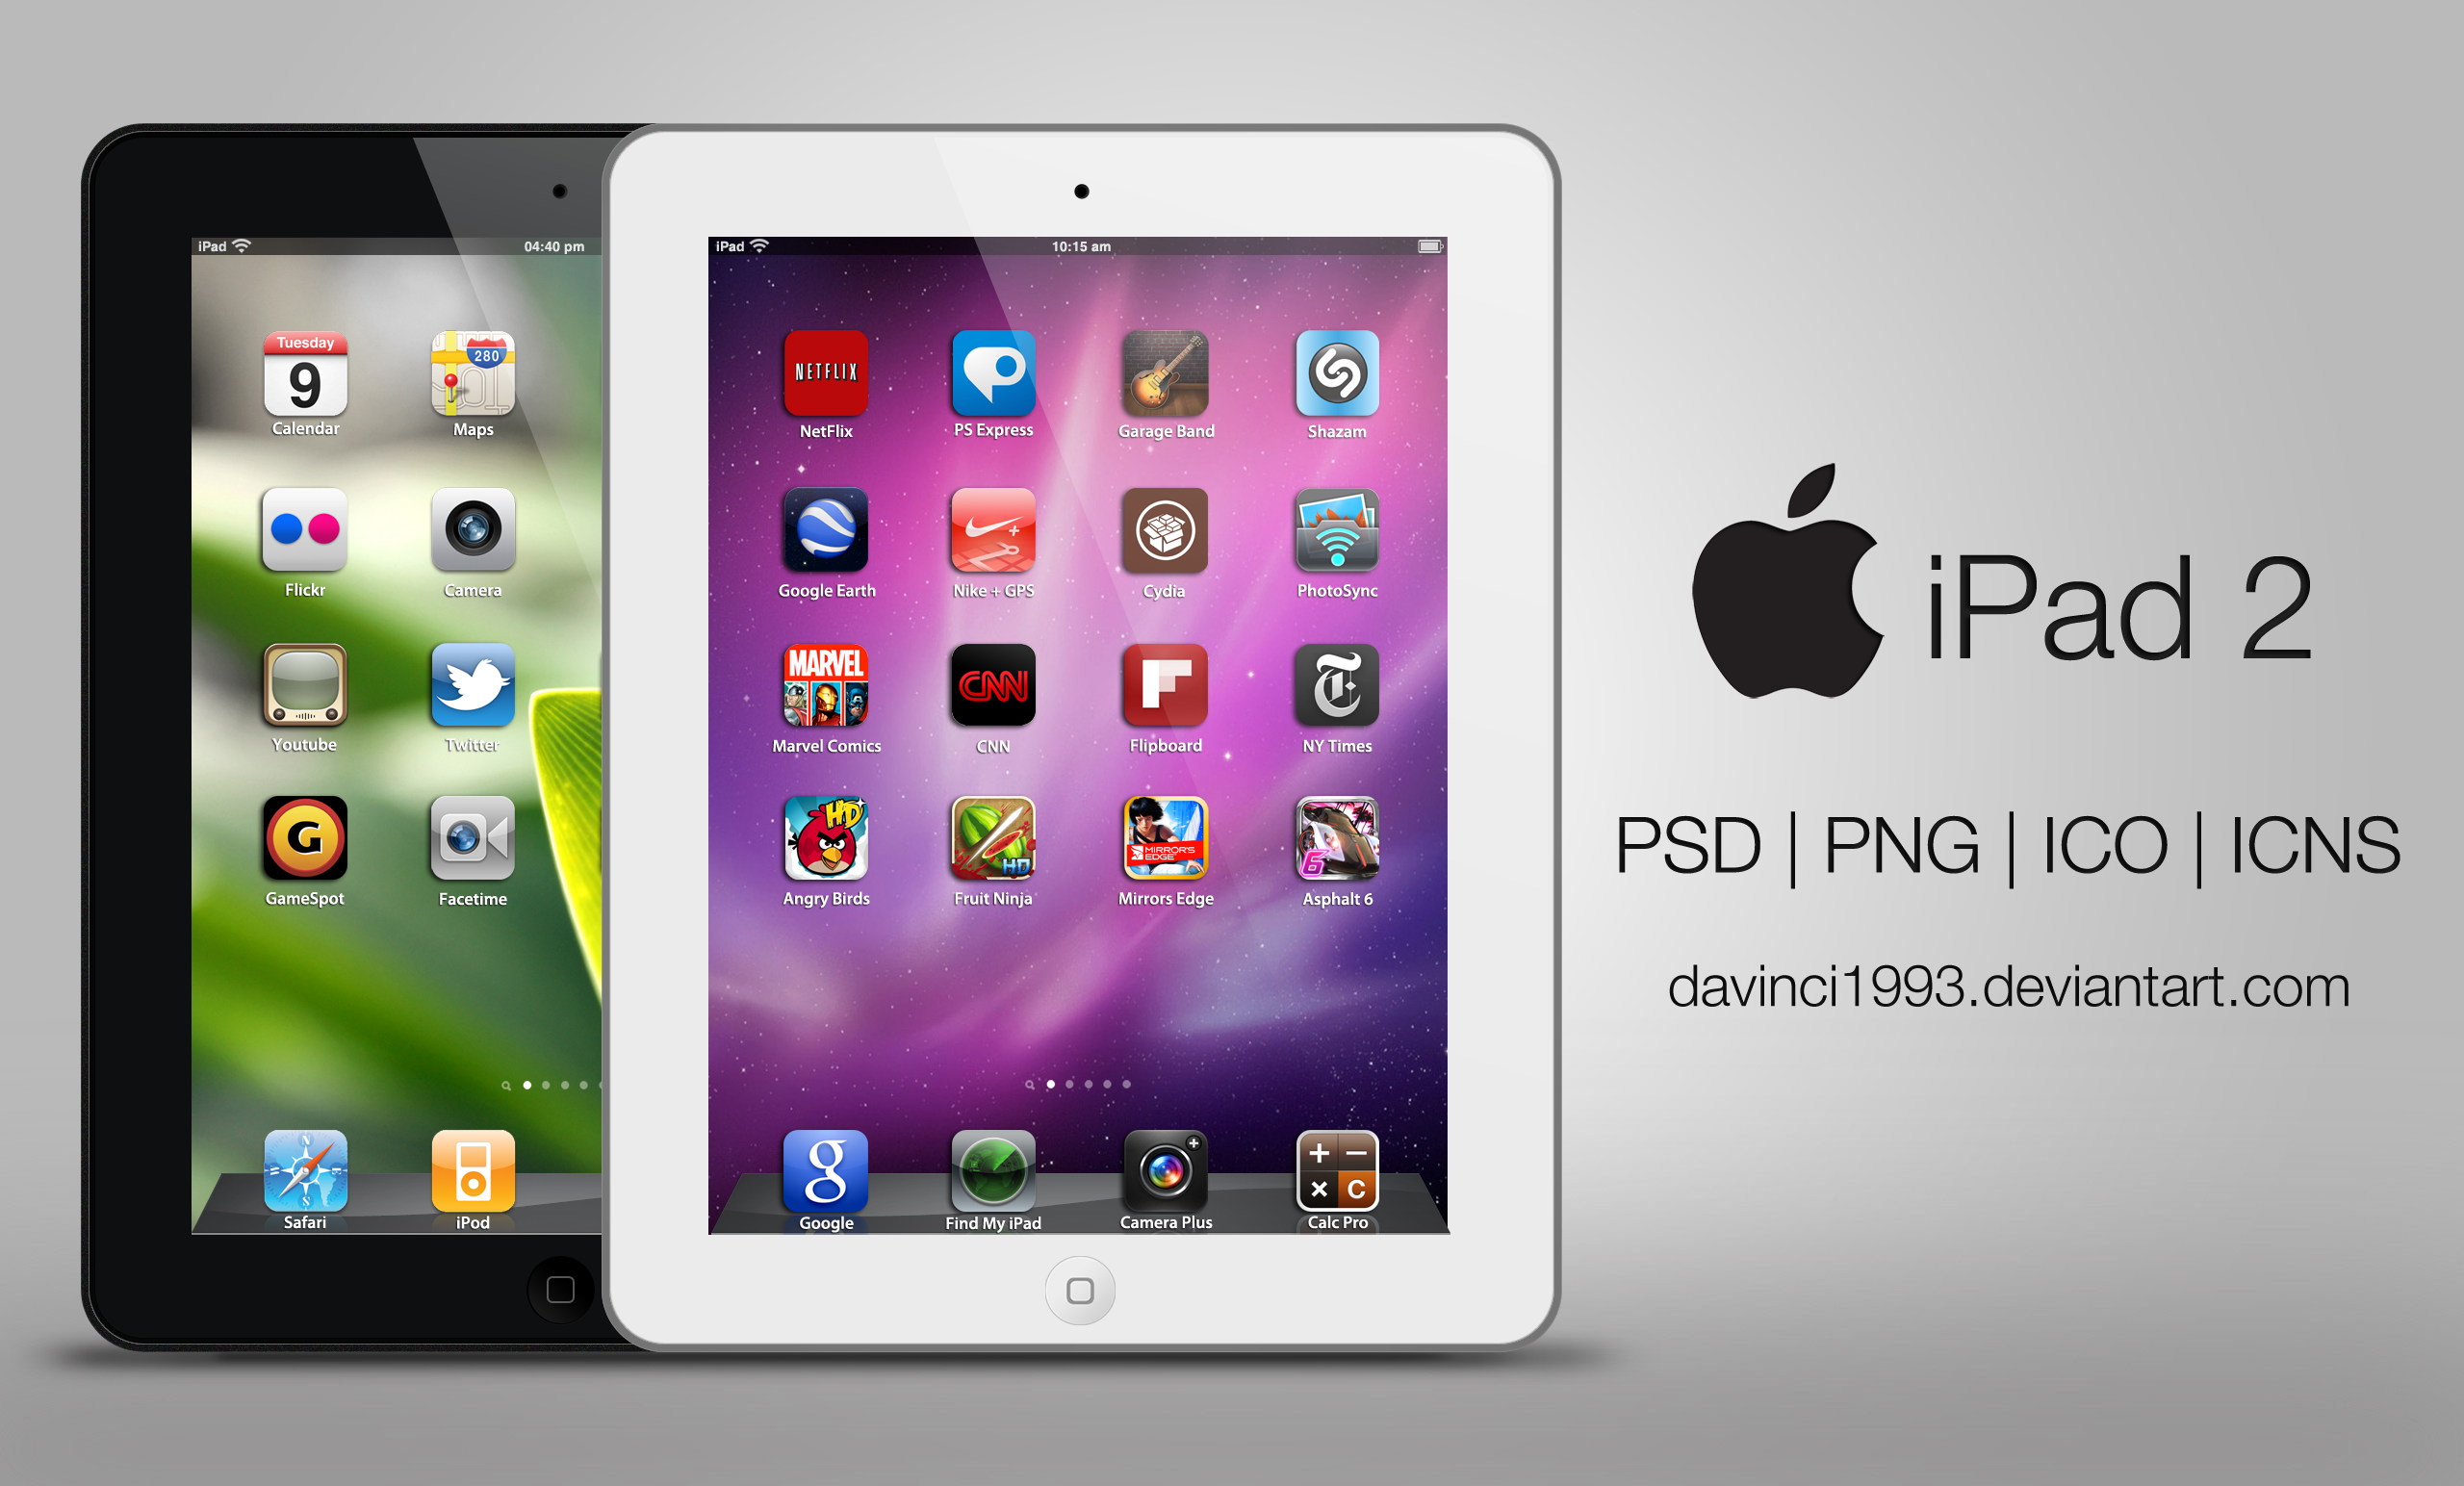 Apple iPad 2: PSD | PNG | ICO | ICNS by davinci1993